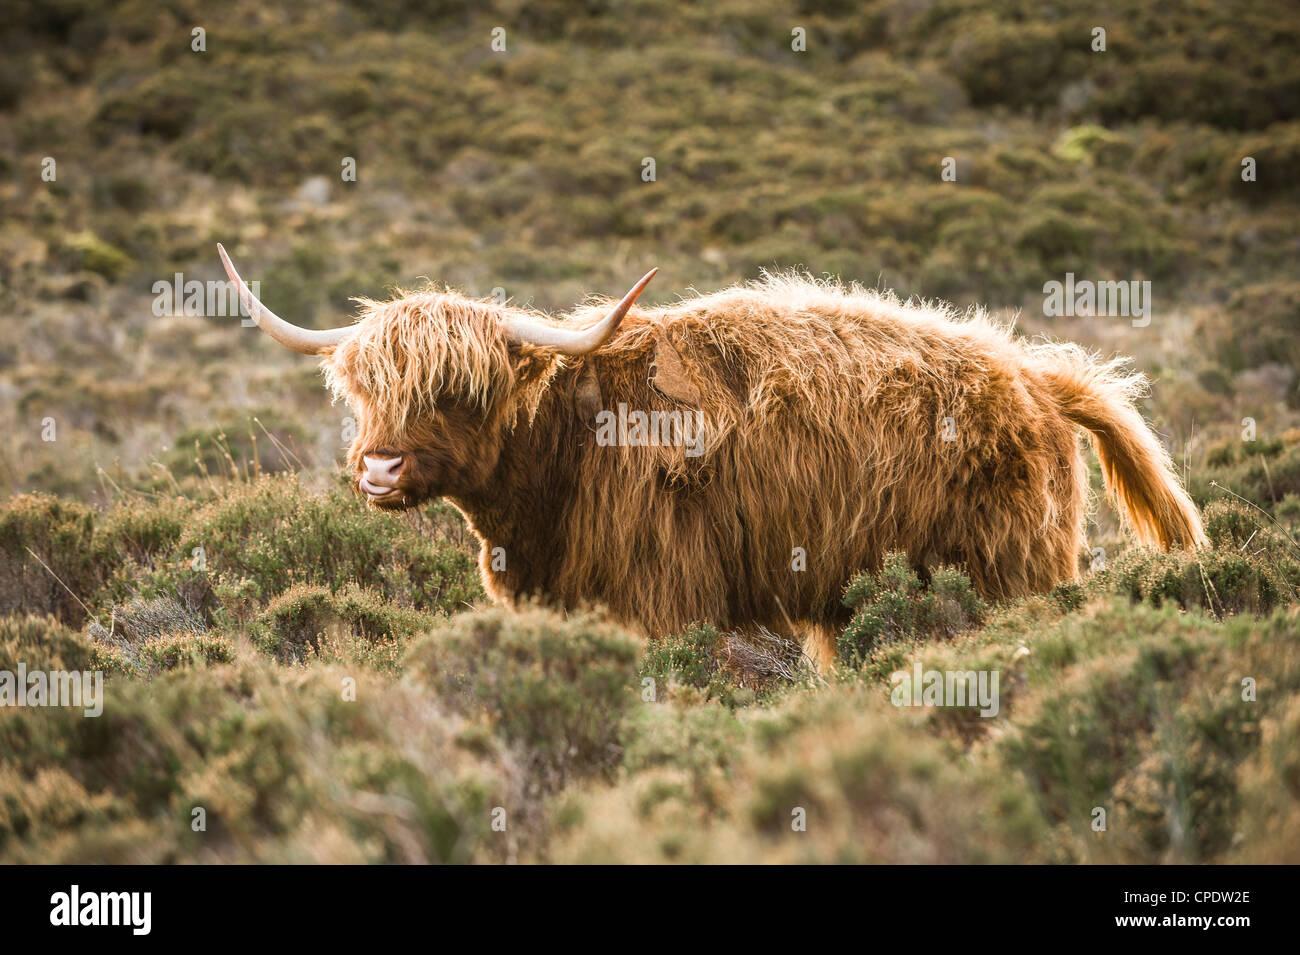 Highland Cattle licking its lips on the Isle of Skye, Scotland - Stock Image